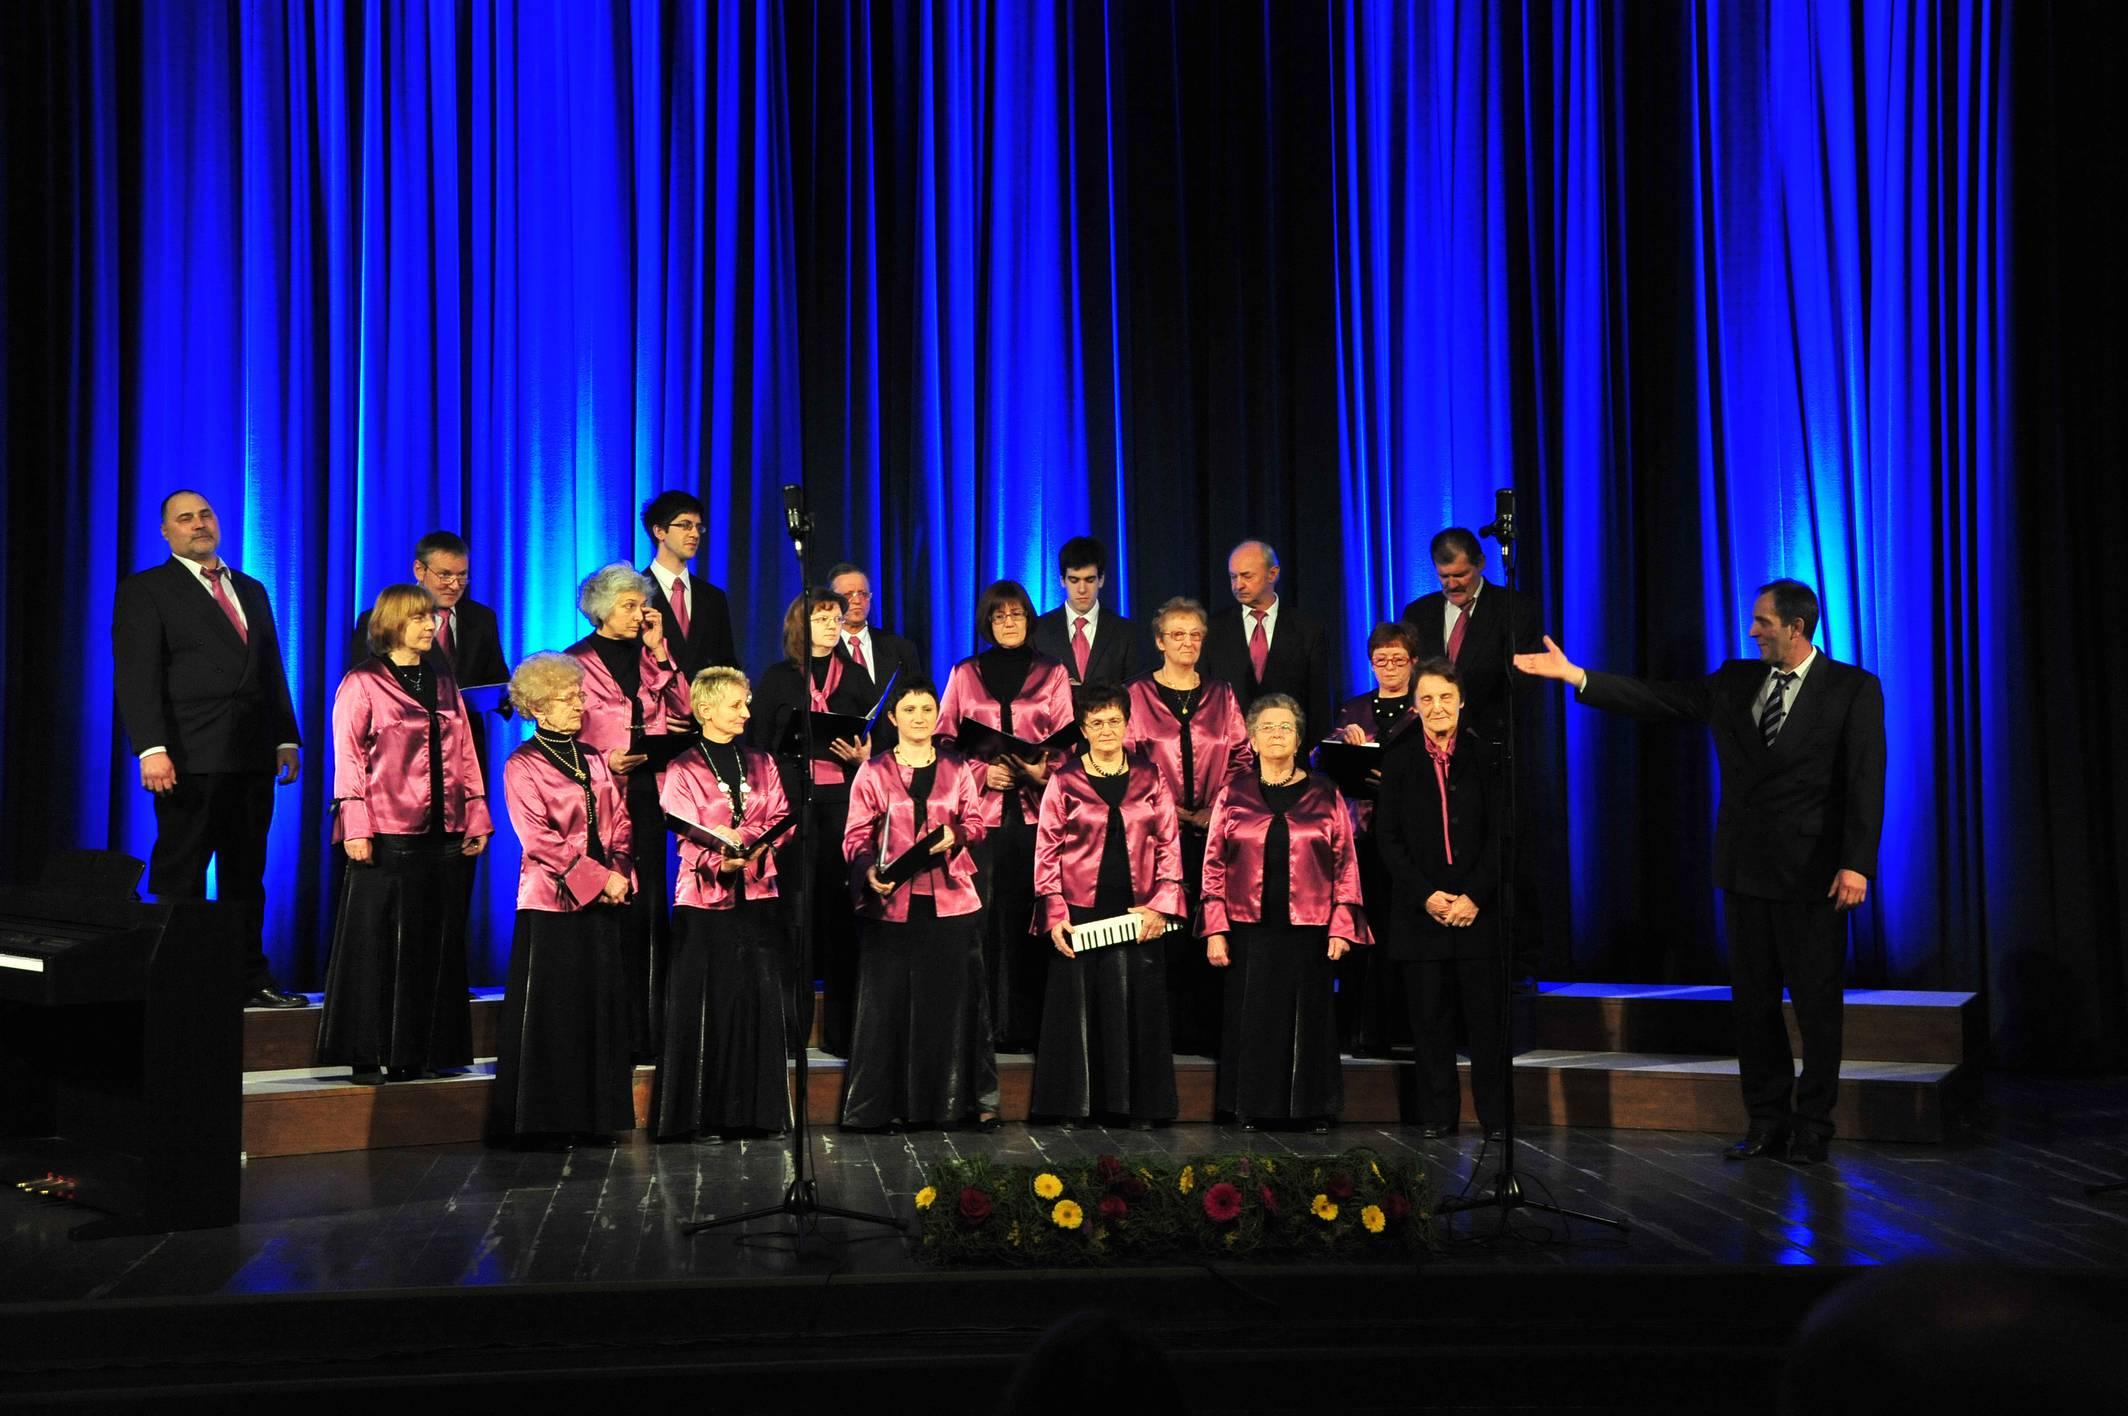 Mešani pevski zbor Žaga